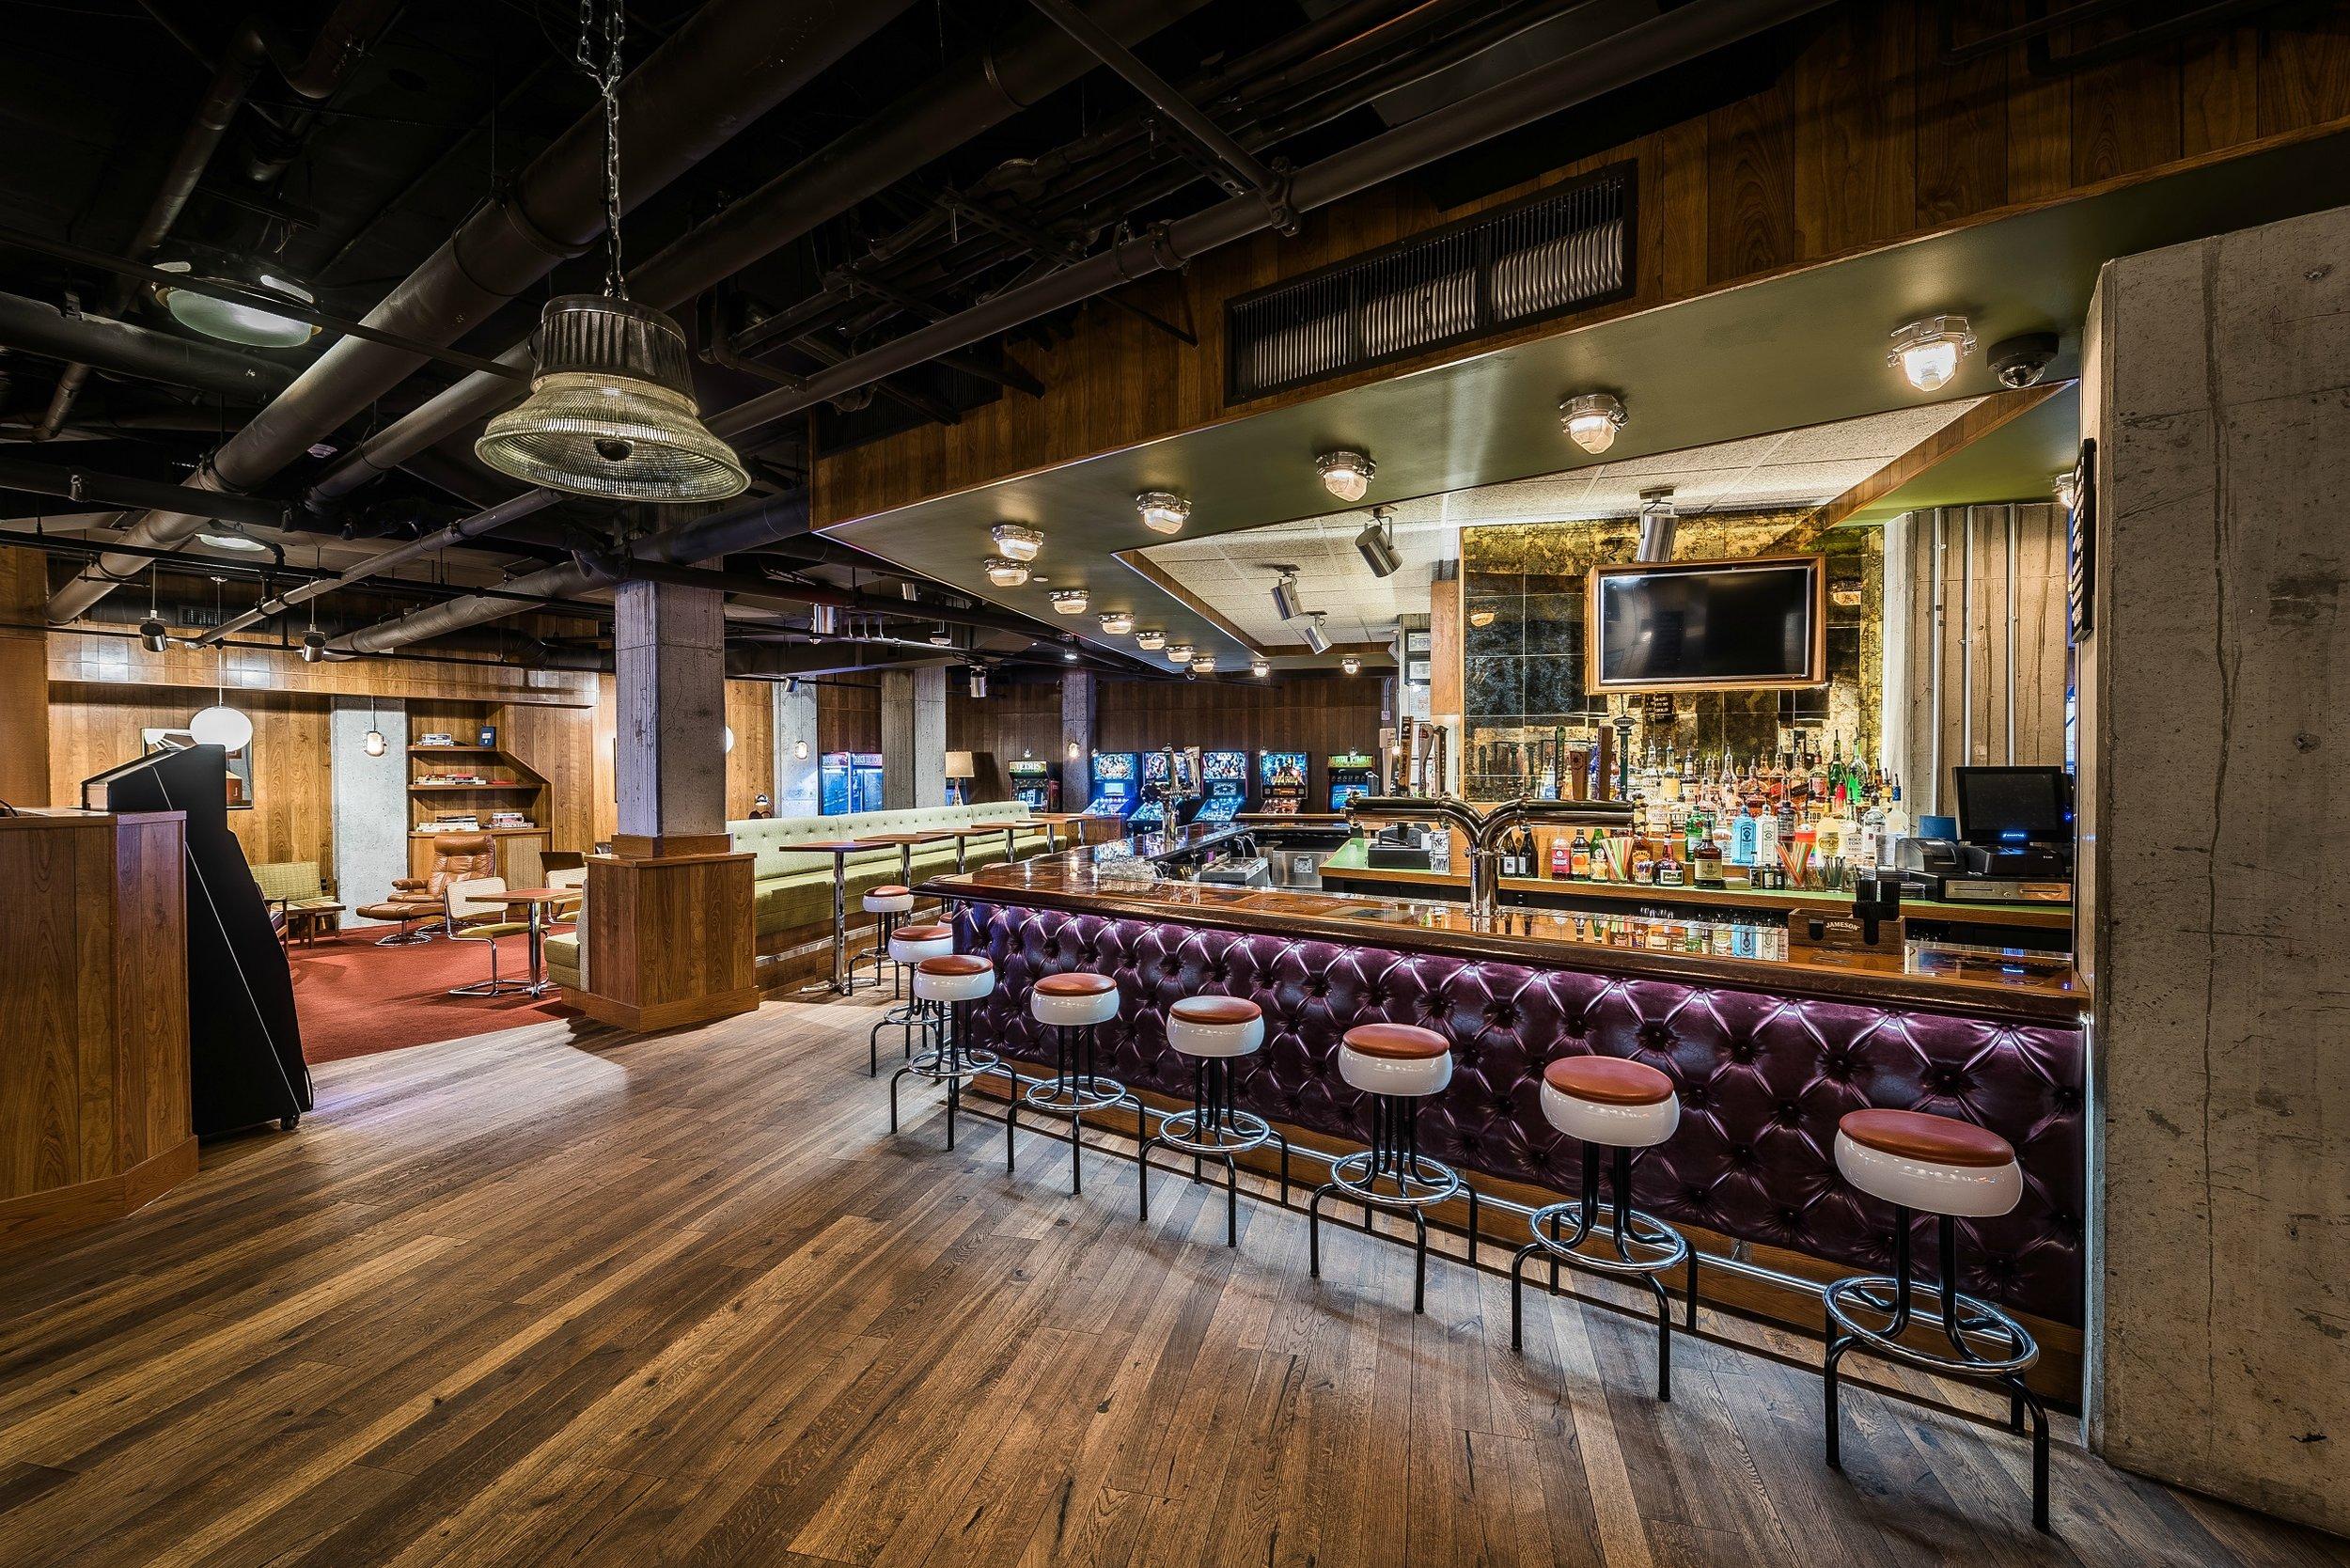 studio-saint-bars-and-restaurants-players-club-washington-dc-lopez-view3.jpg